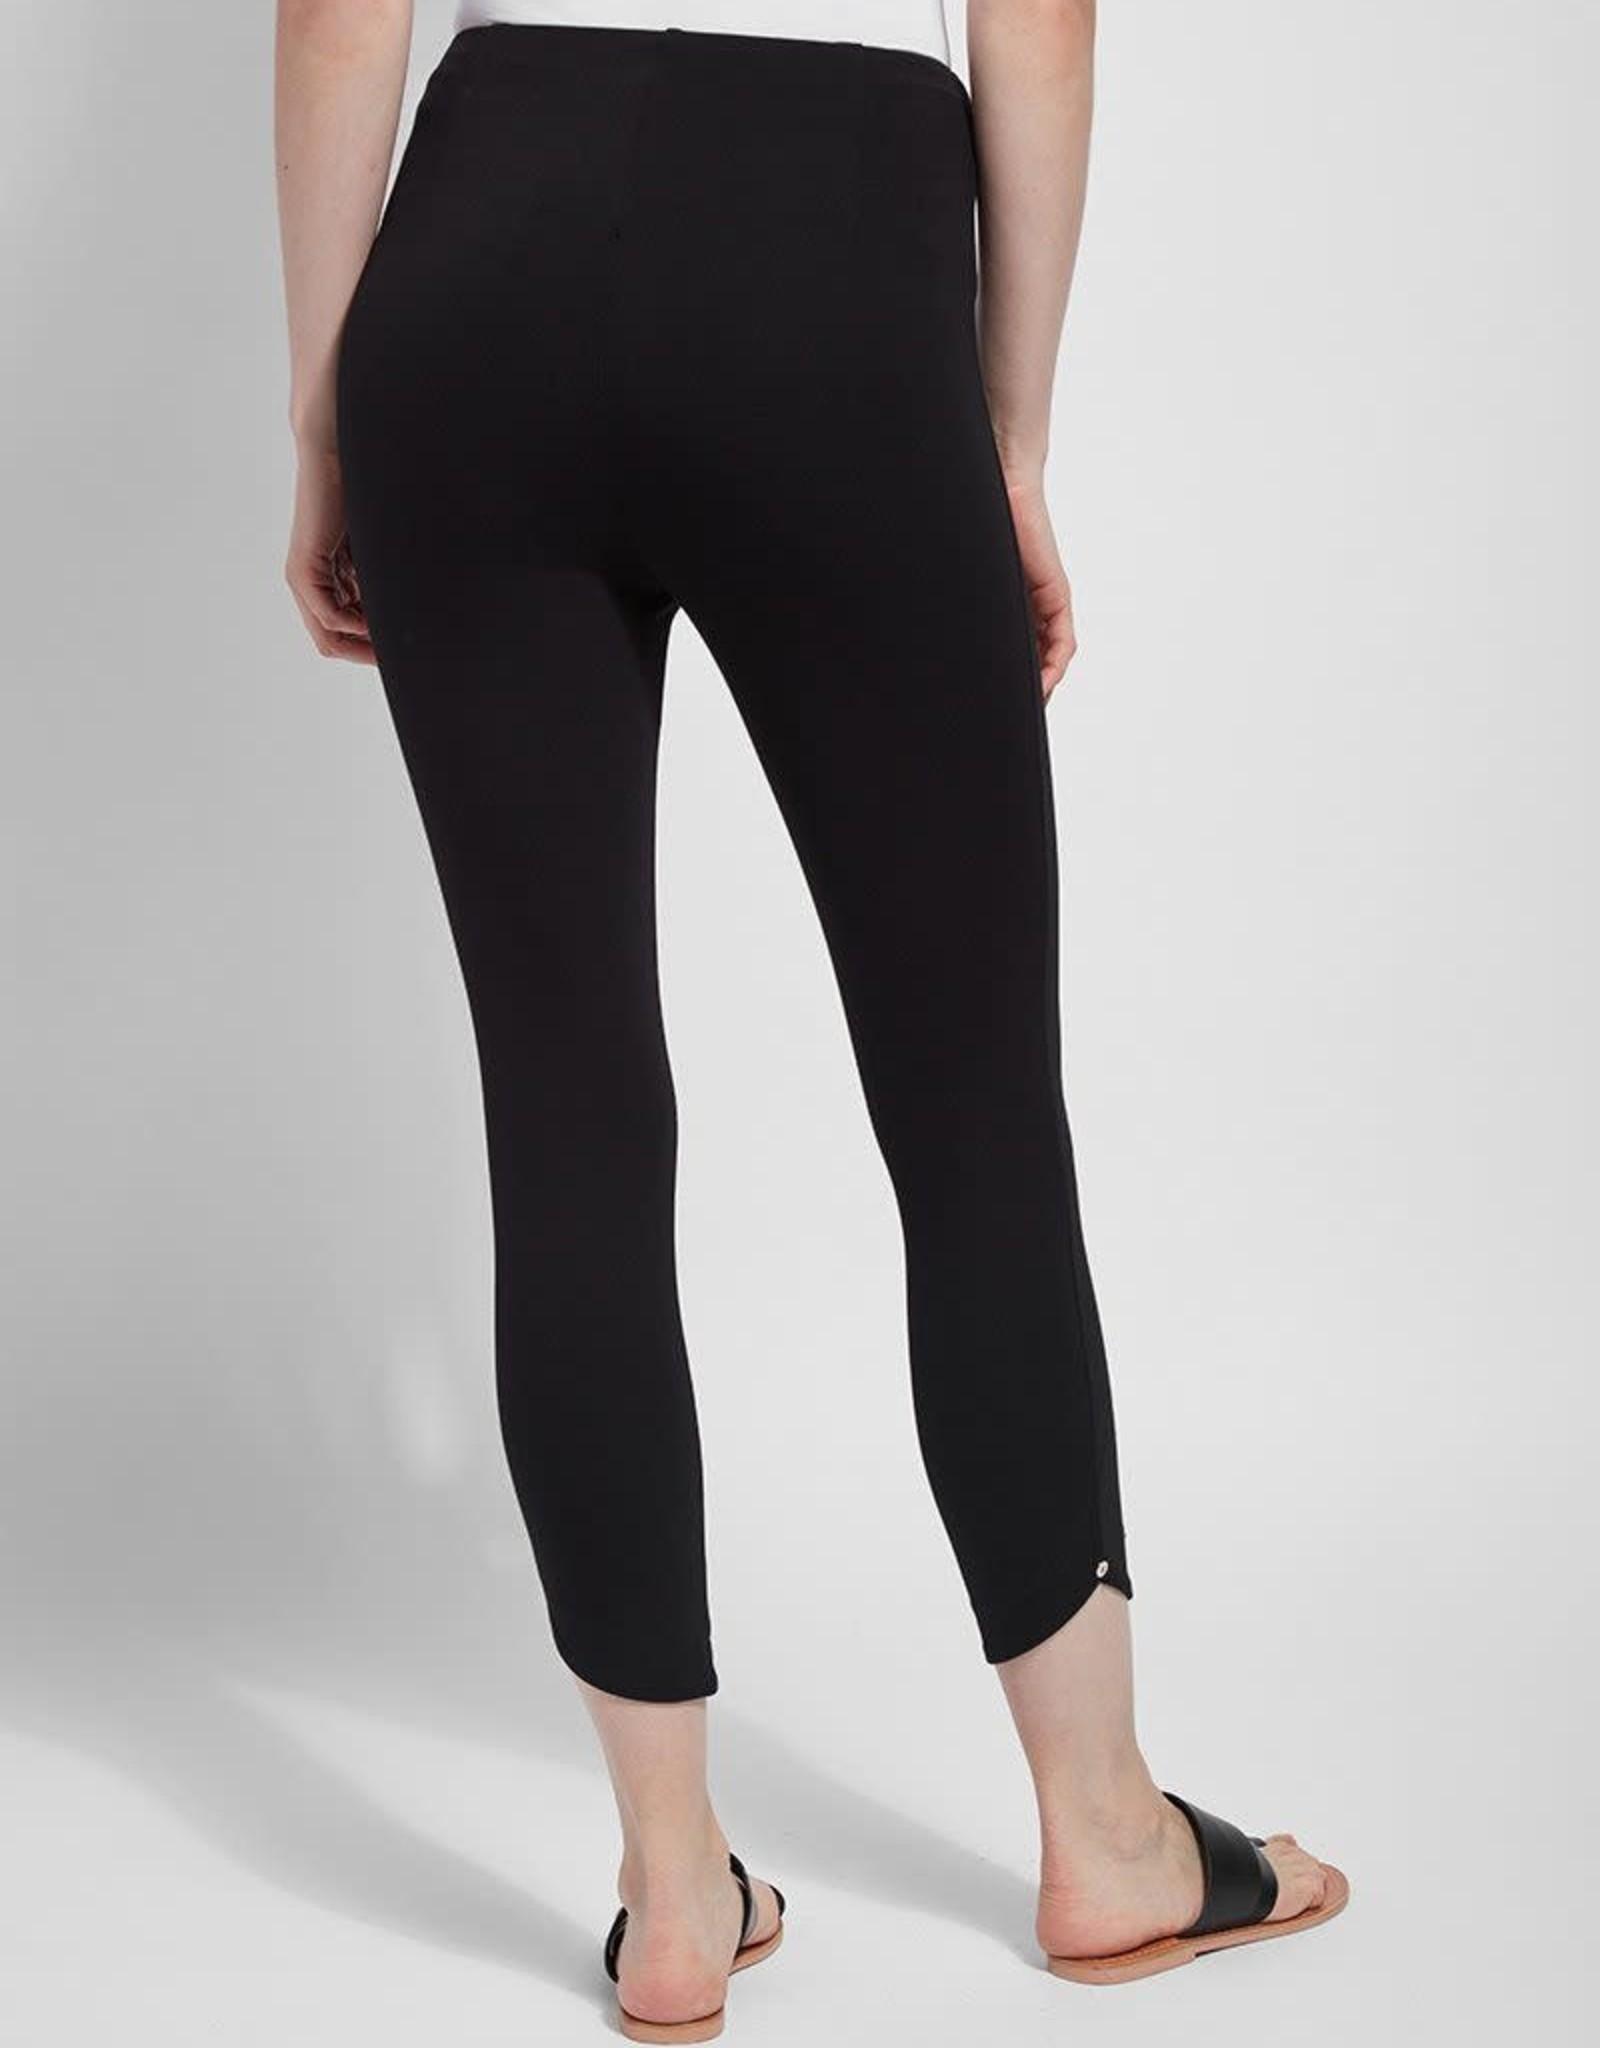 Lysse Black Crop Ponte Legging w/Ankle Embellishment